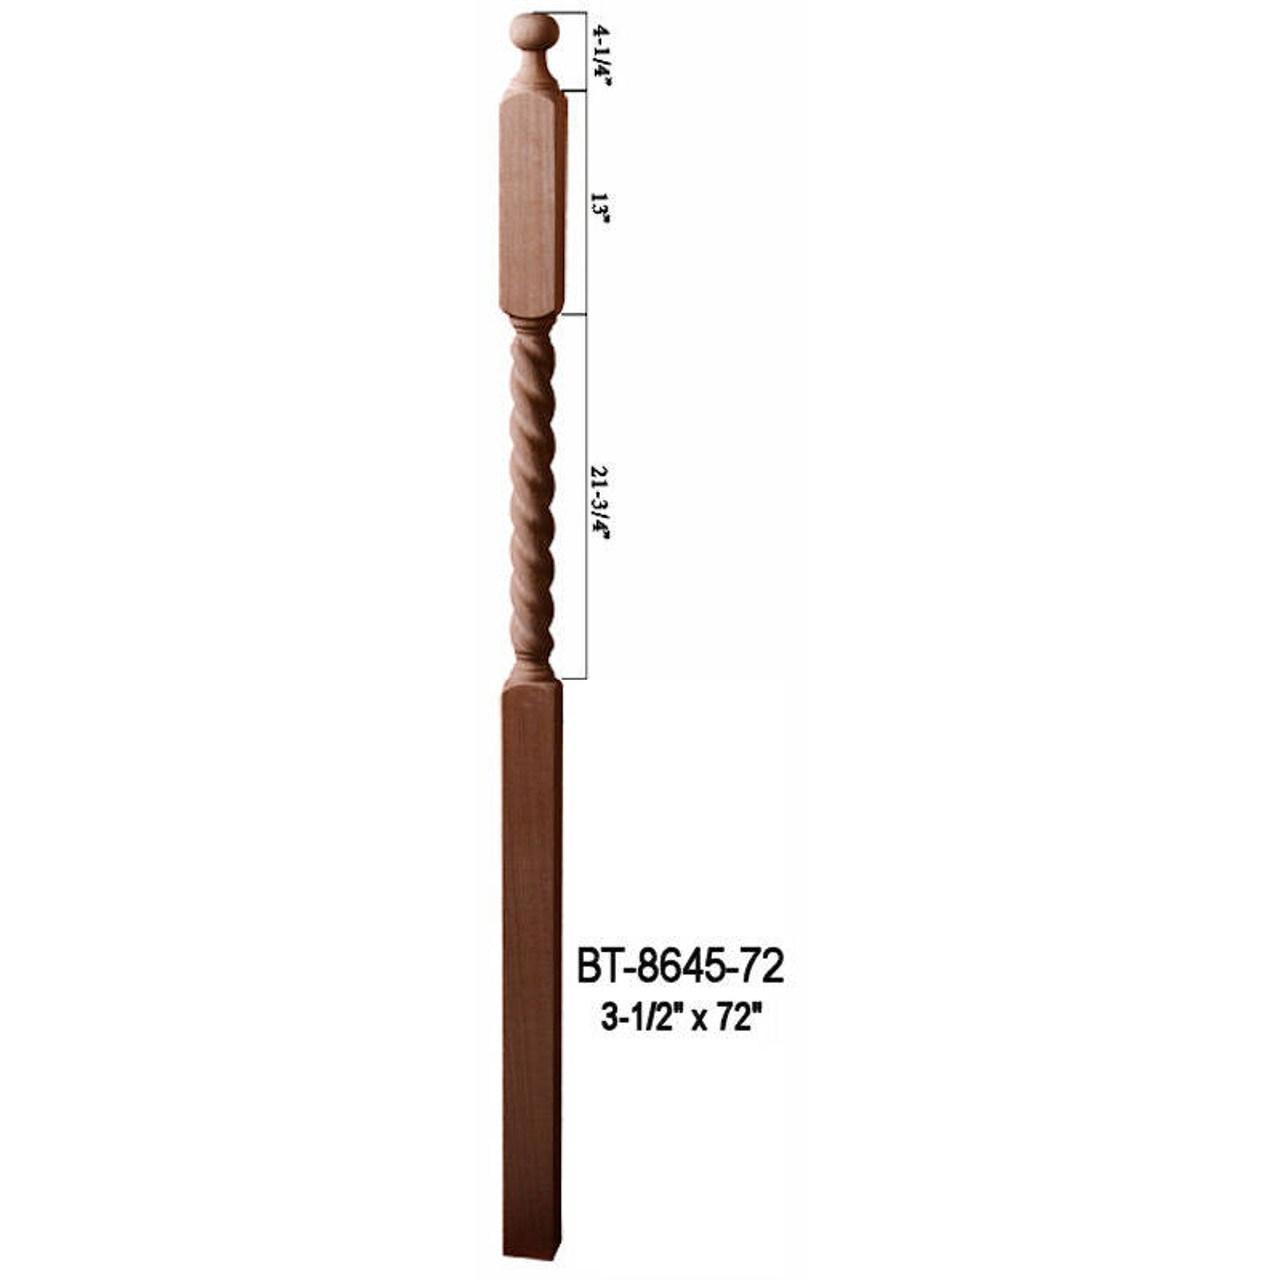 Bt 8645 72 72 Barley Rope Twist Ball Top Lascala Newel Post   Barley Twist Newel Post   Column   1930 Style   20'S   Spindle   Square